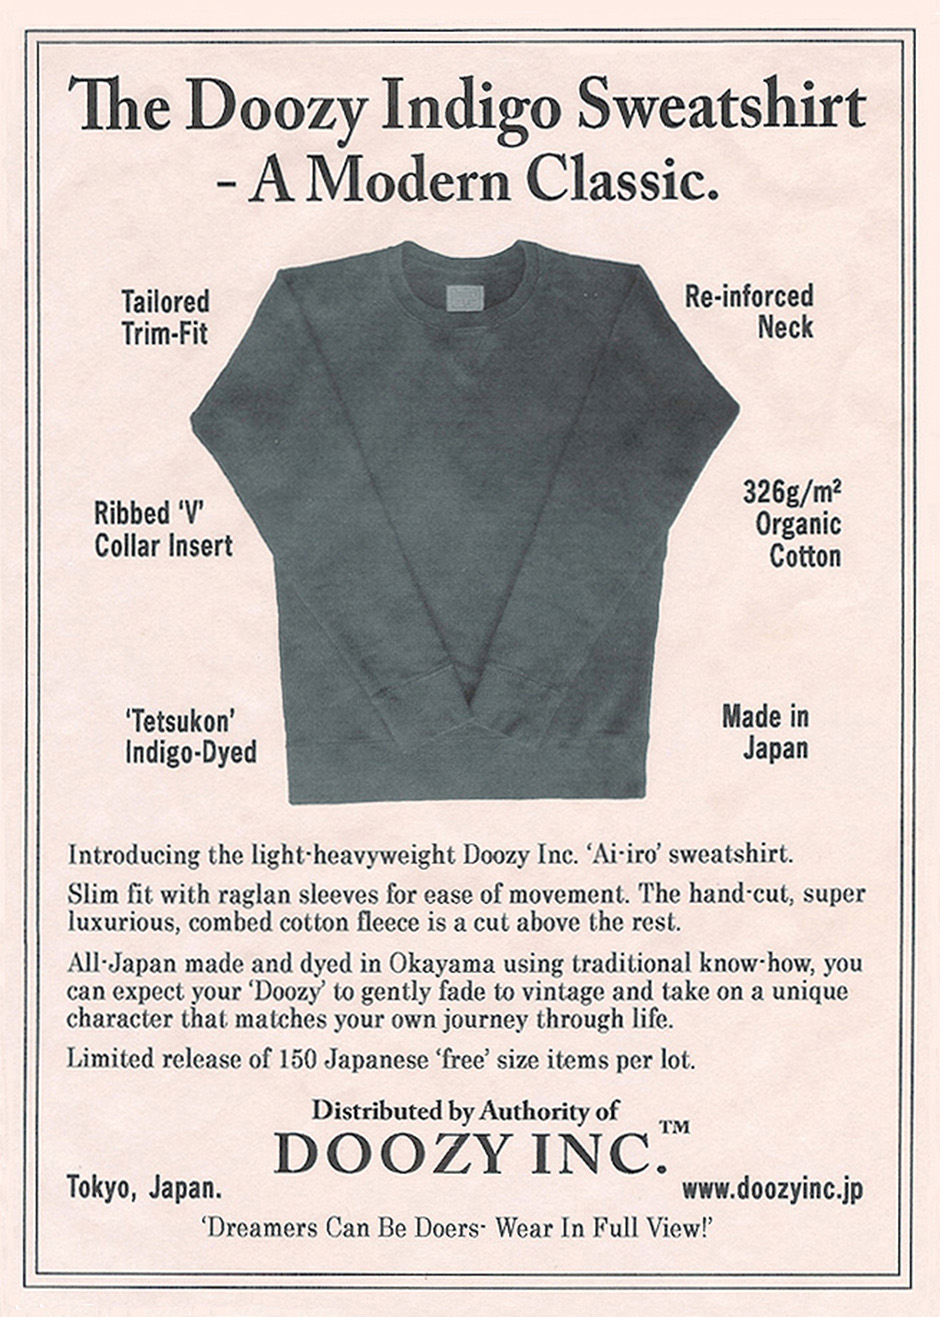 Doozyインディゴスウェットシャツの2014年秋/冬雑誌用広告